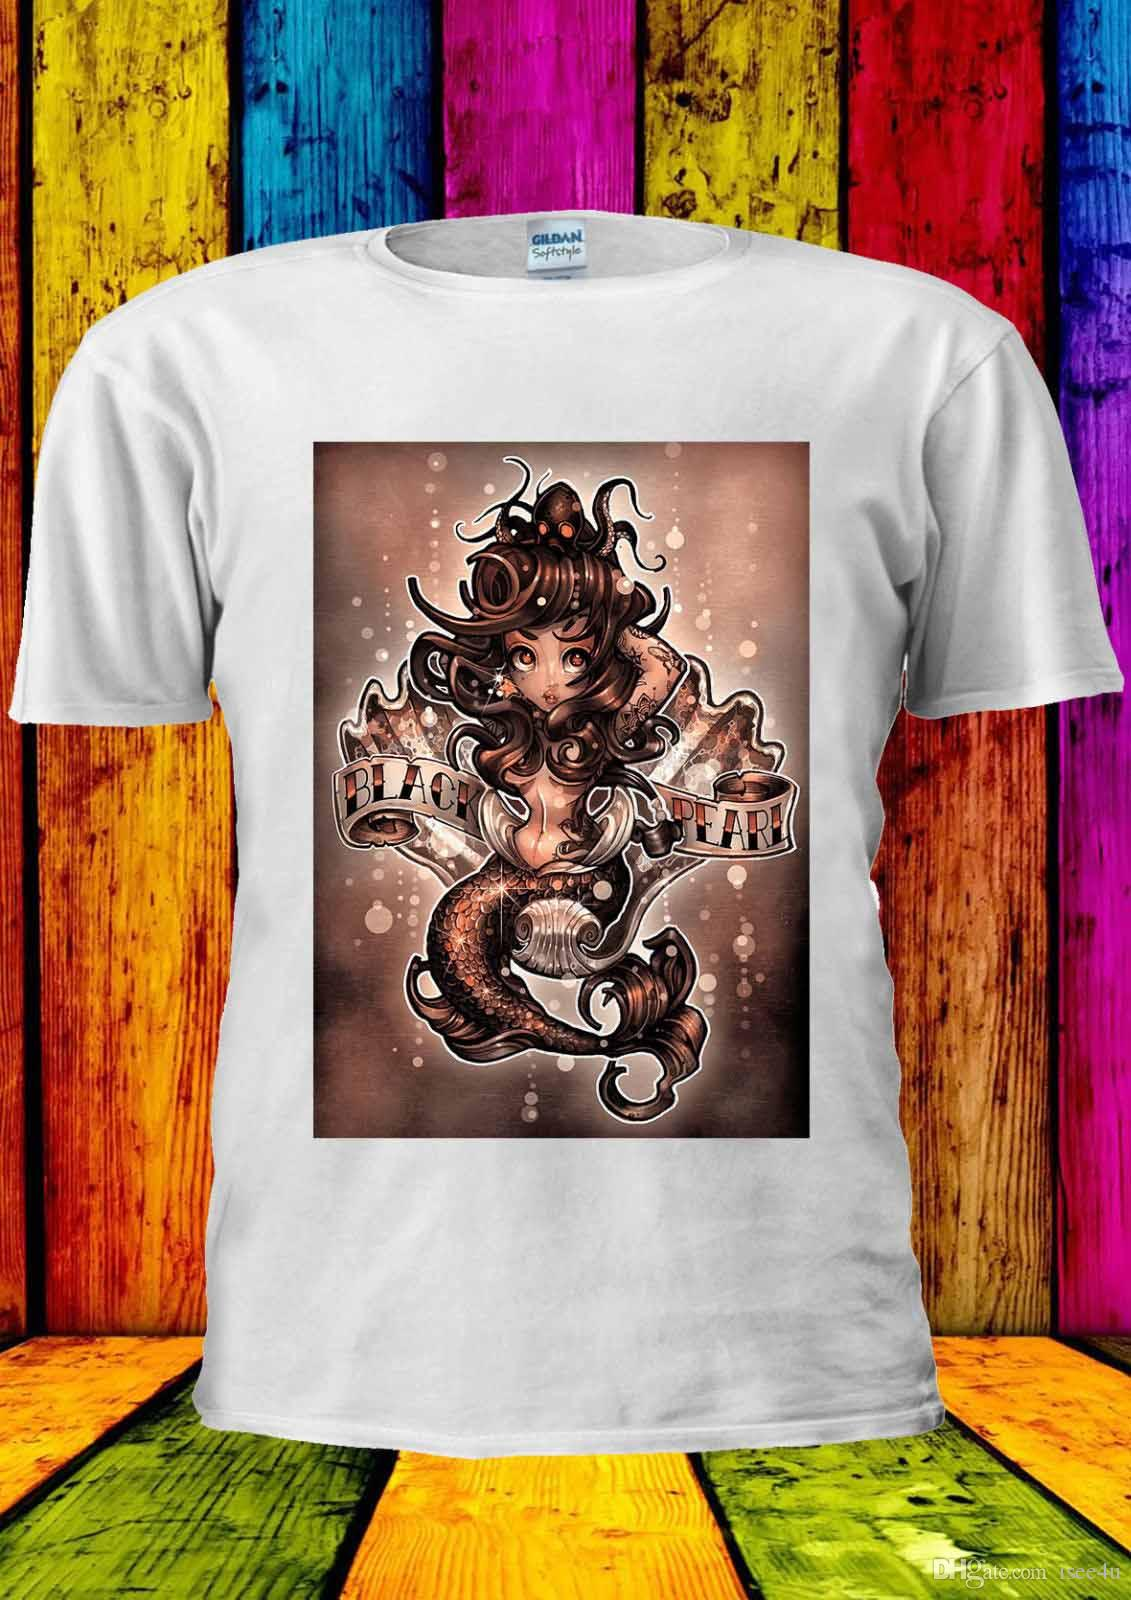 174aafbc7 Acquista Mermaid Ariel Art Paint Black Pearl T Shirt Vest Canotta Uomo  Donna Unisex 2195 A  13.19 Dal Isee4u